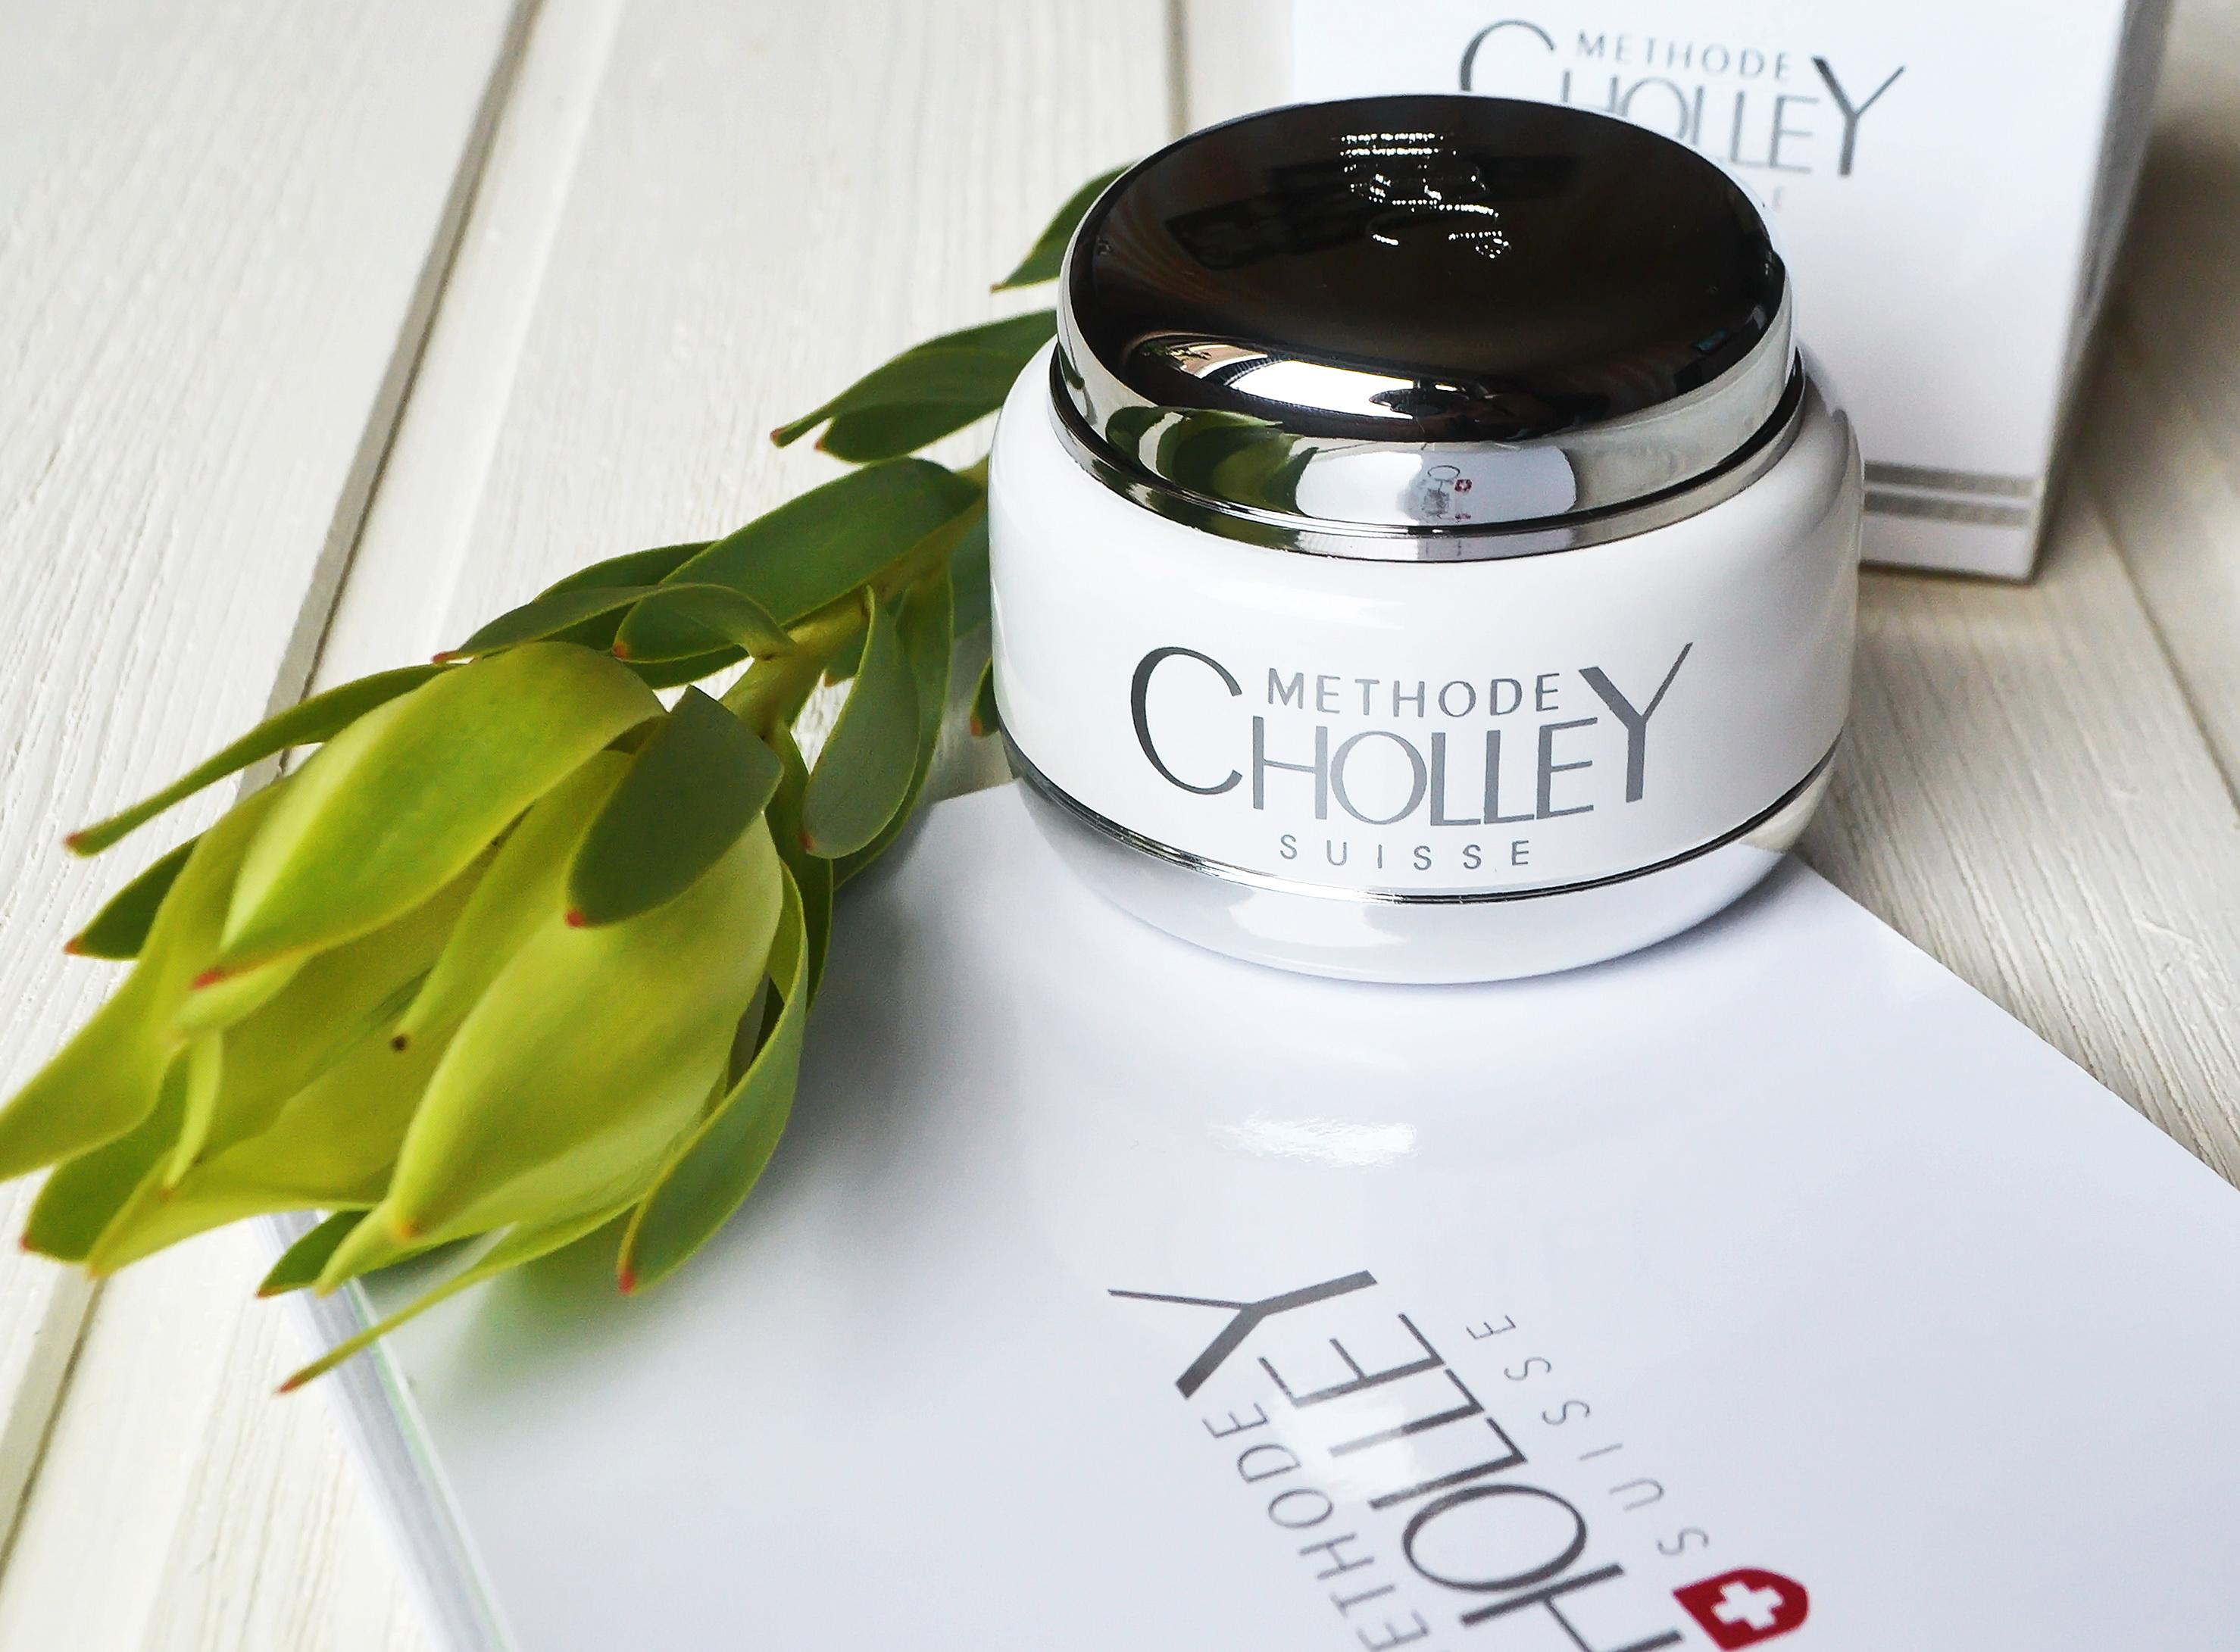 Объект желания: крем с AHA кислотами от Methode Cholley с обновляющим действием